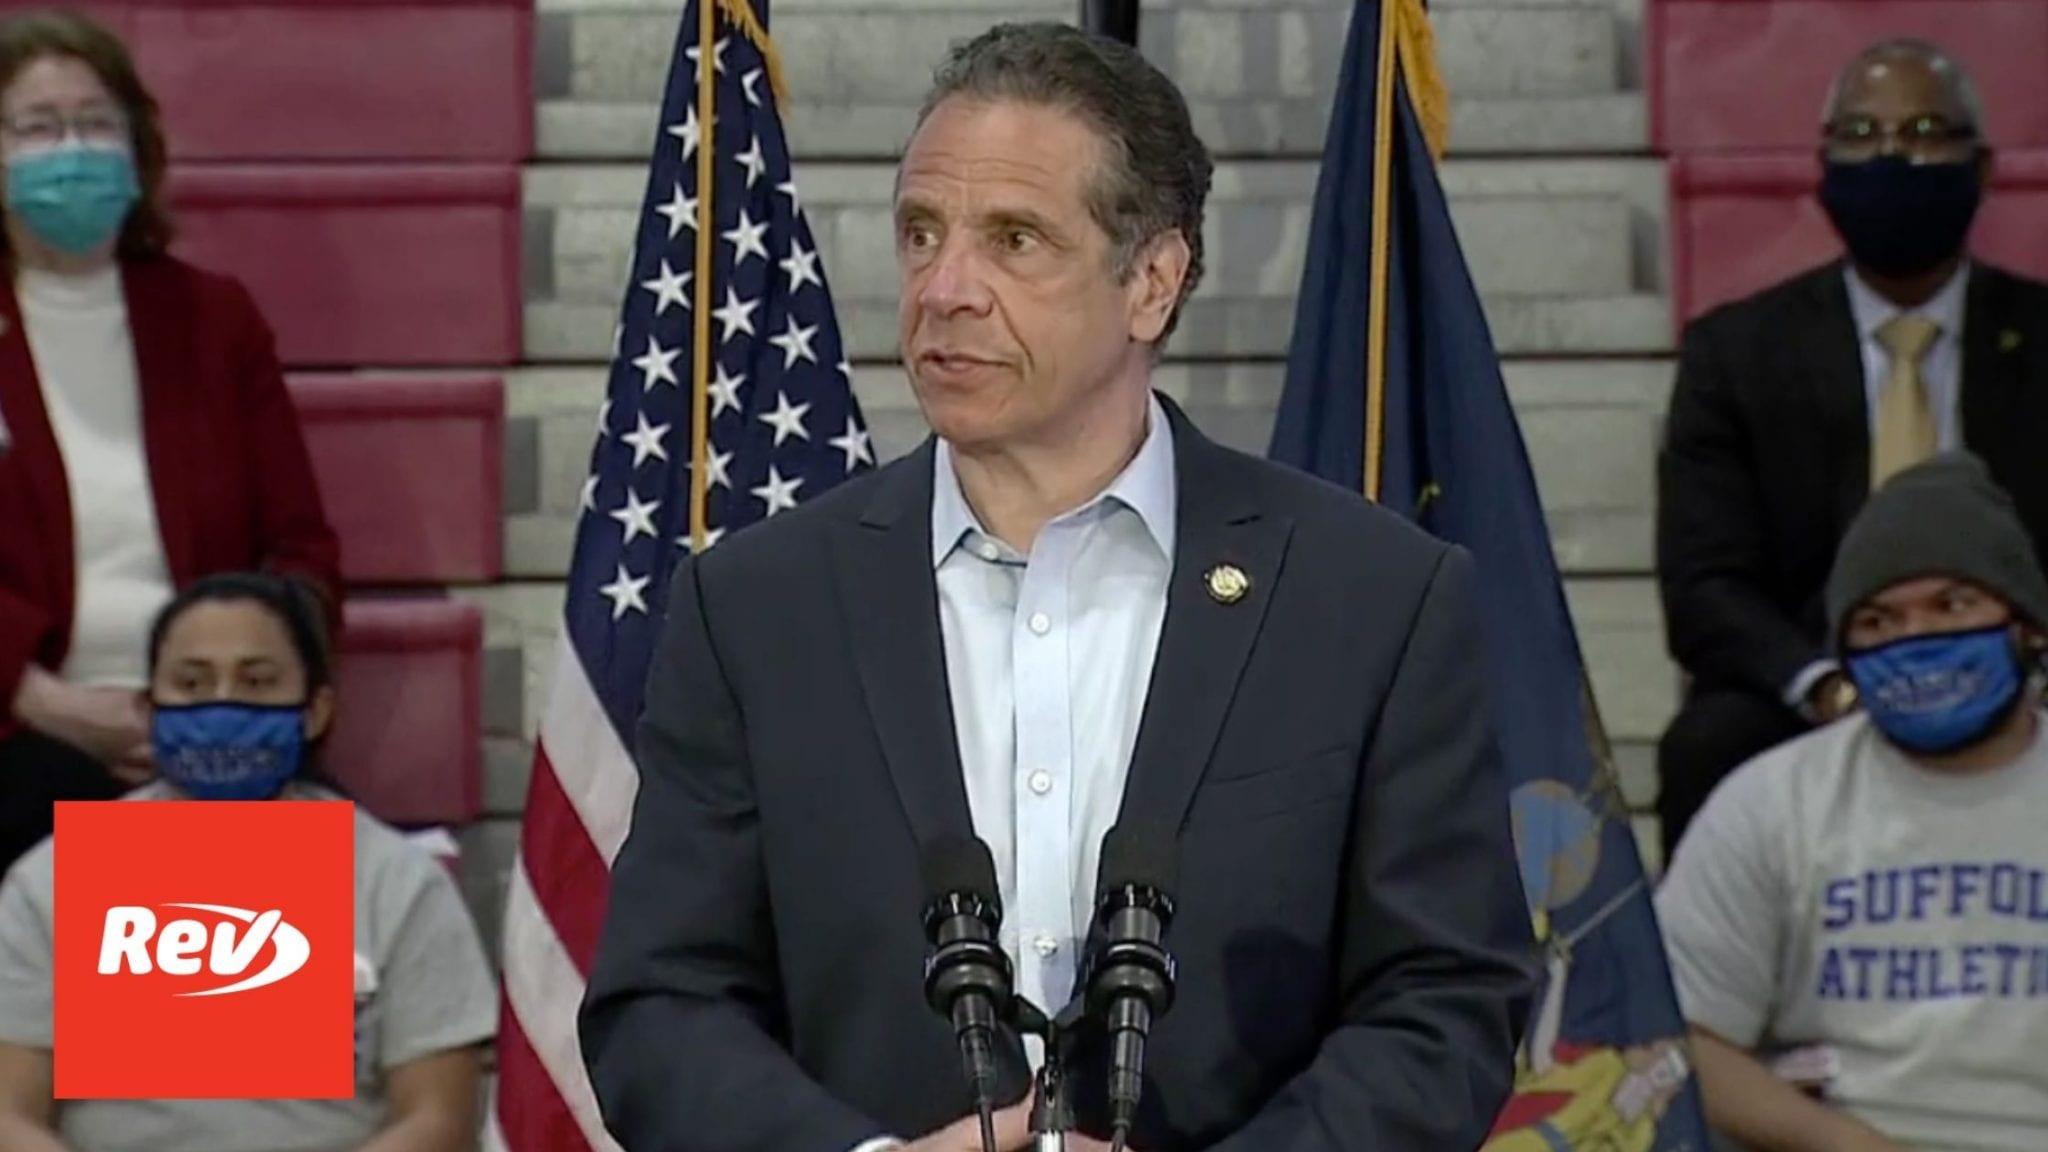 New York Gov. Andrew Cuomo COVID-19 Press Conference Transcript April 12